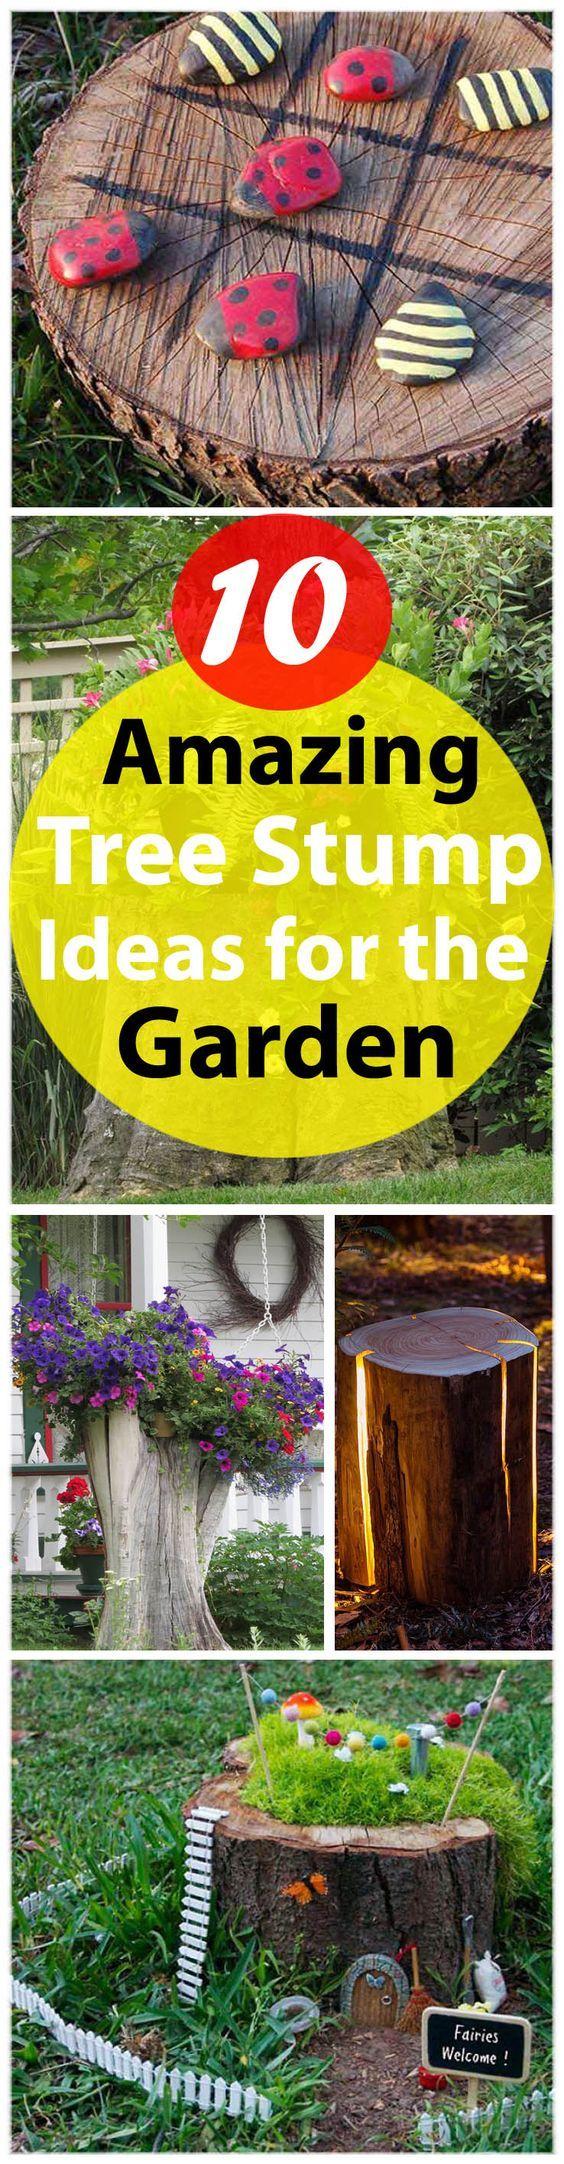 10 Amazing Tree Stump Ideas for the Garden